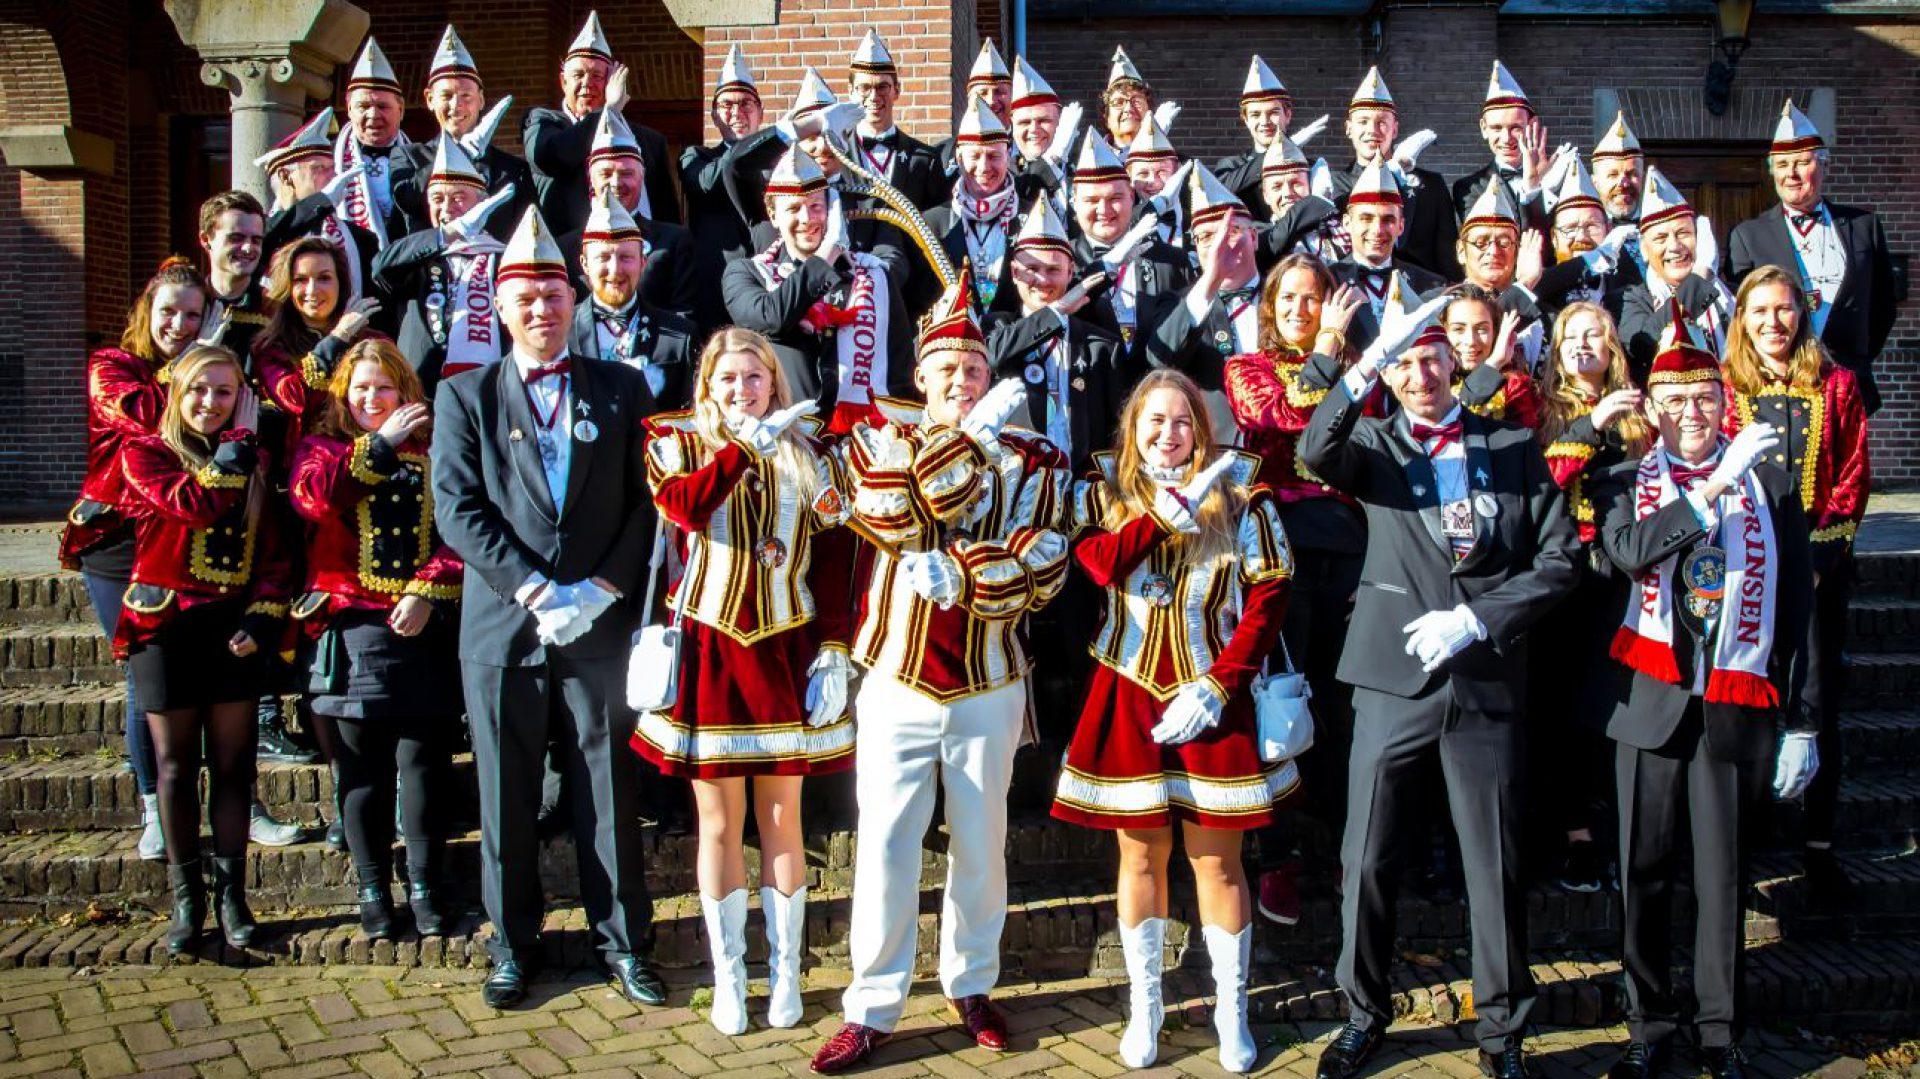 Carnavalsvereniging c.v. de Cavalieren